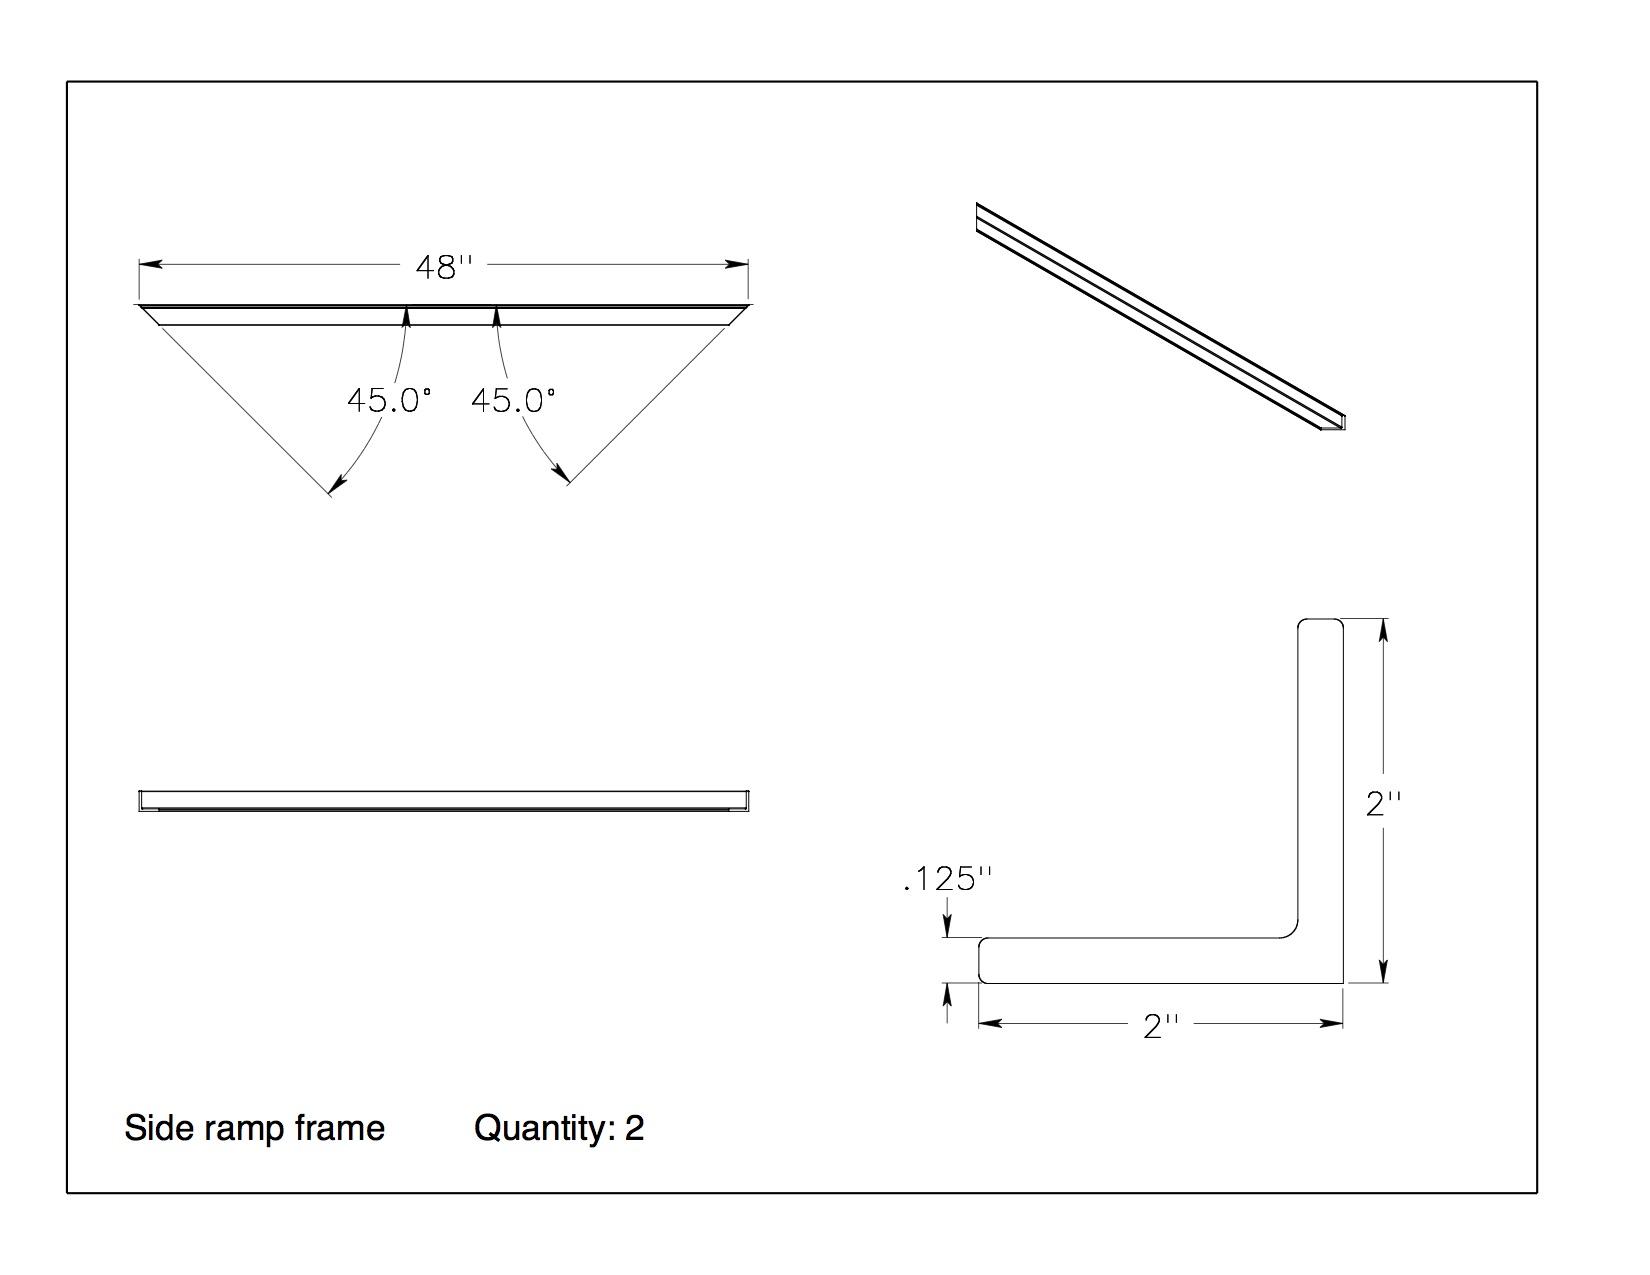 Heavy Duty Landscape Cart furthermore 5x8 Utility Trailer Plans also 5x8 Cargo Trailer also 400733515456 also 347621664970400552. on 5x8 utility trailer plans